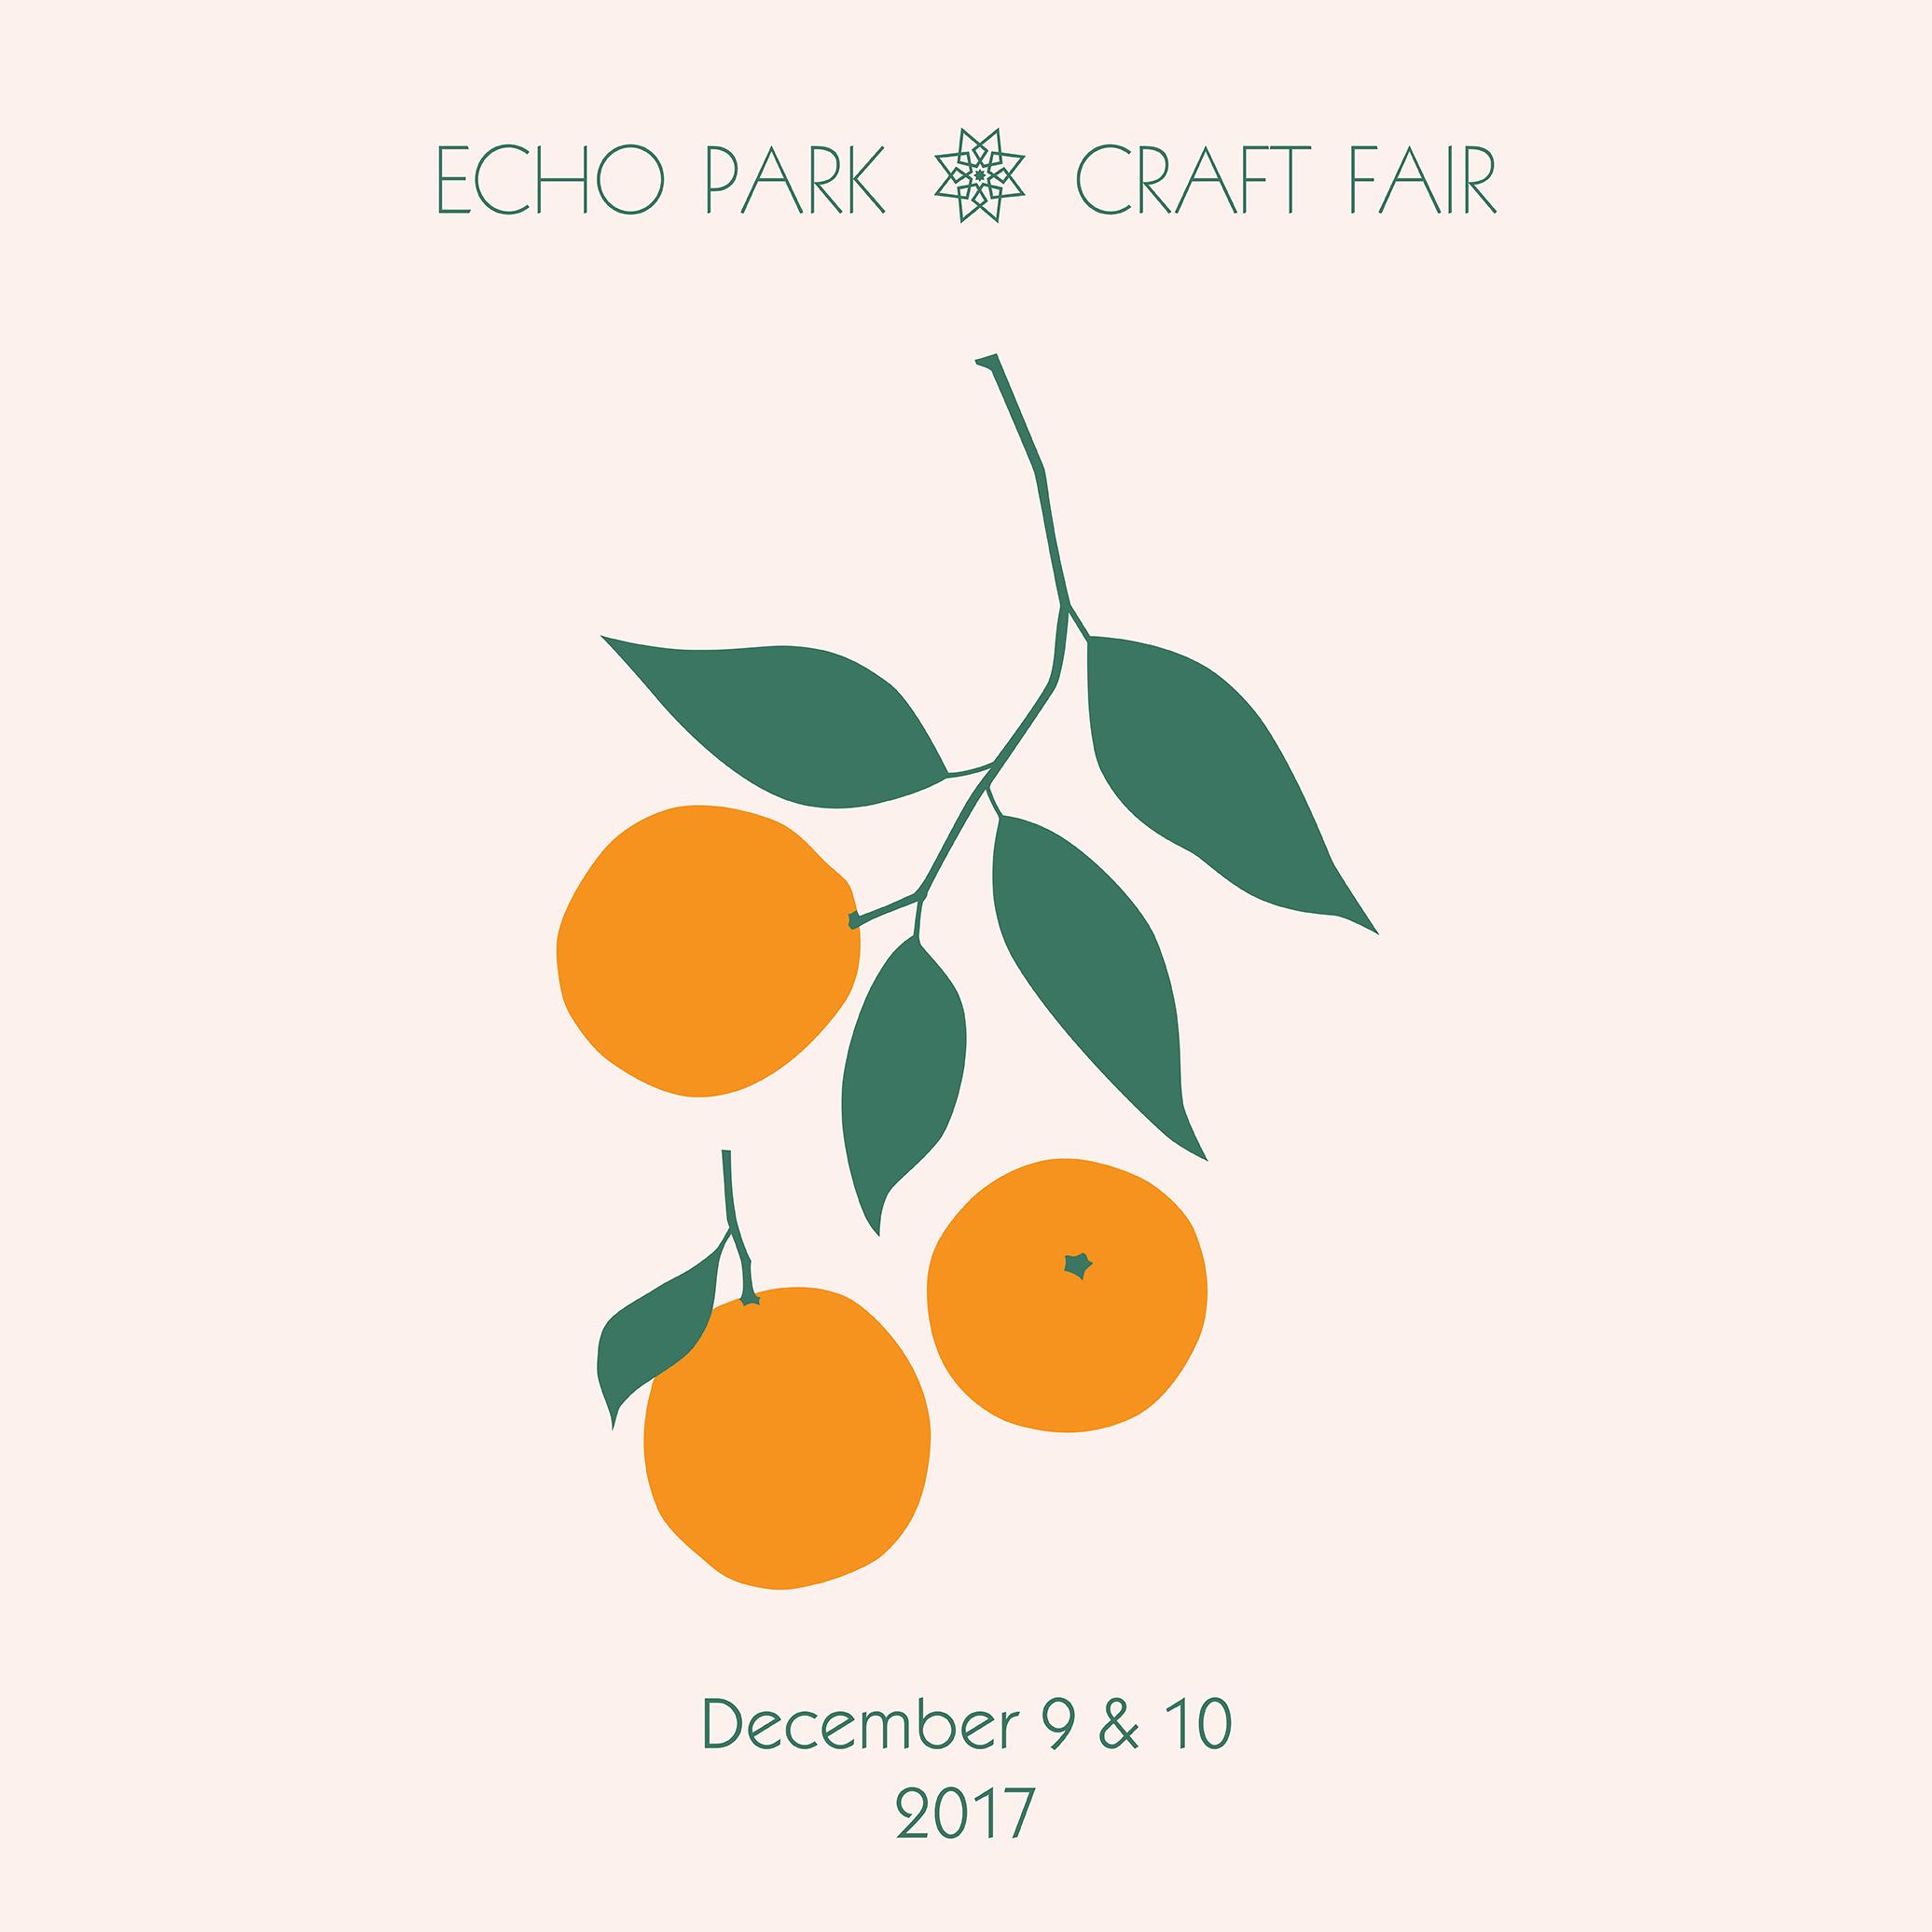 12/9/17 & 12/10/17 @ ECHO PARK CRAFT FAIR, LA •CALIFORNIA